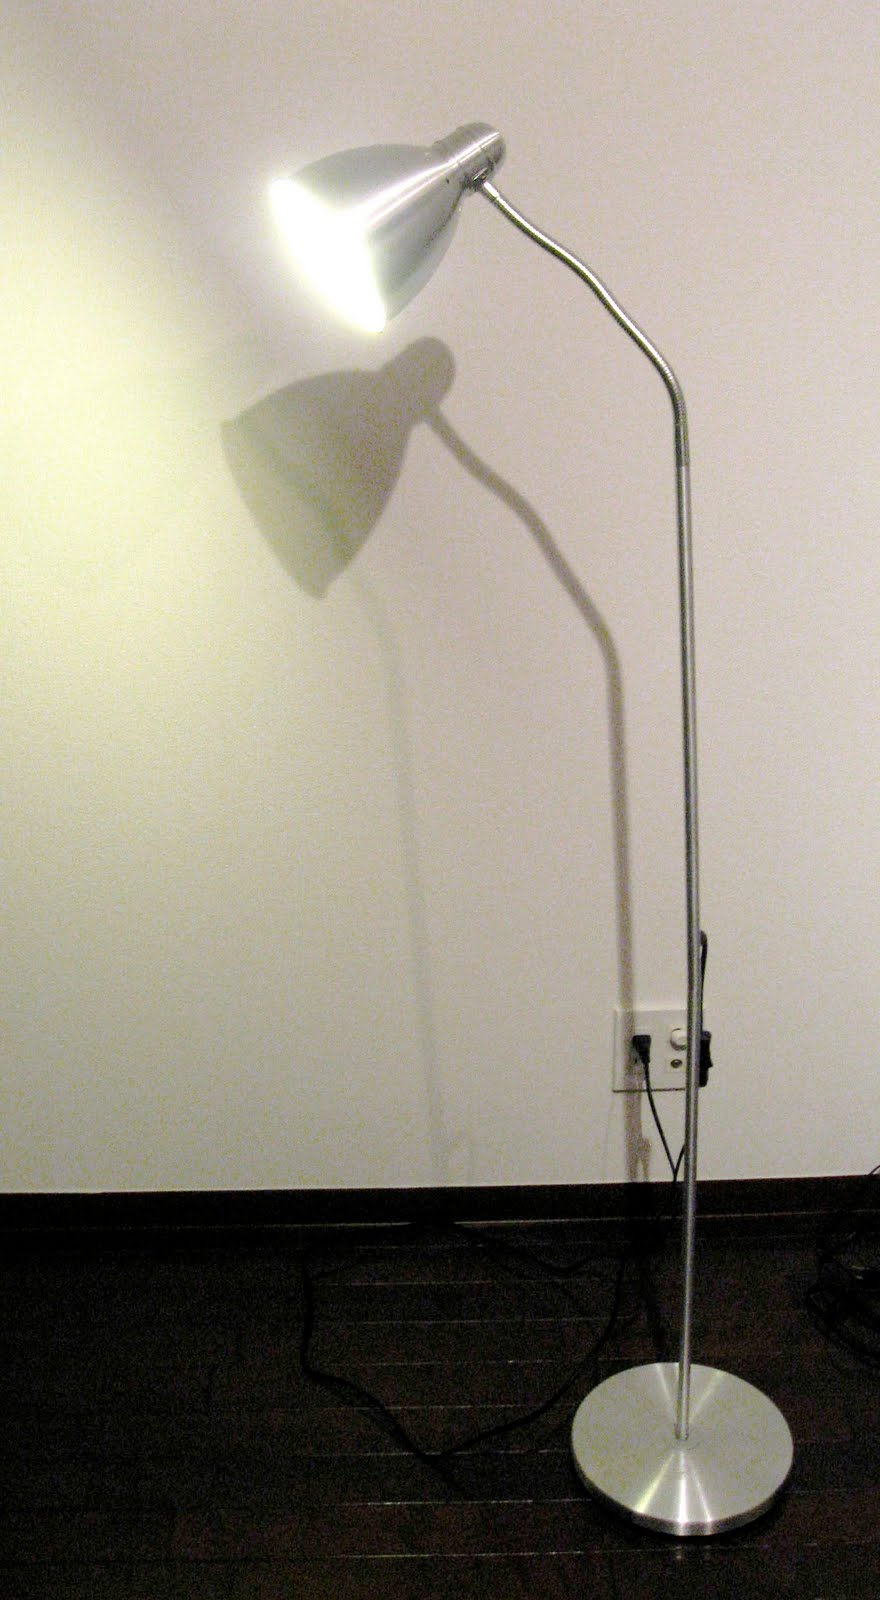 harajuku sayonara free standing ikea lamp. Black Bedroom Furniture Sets. Home Design Ideas